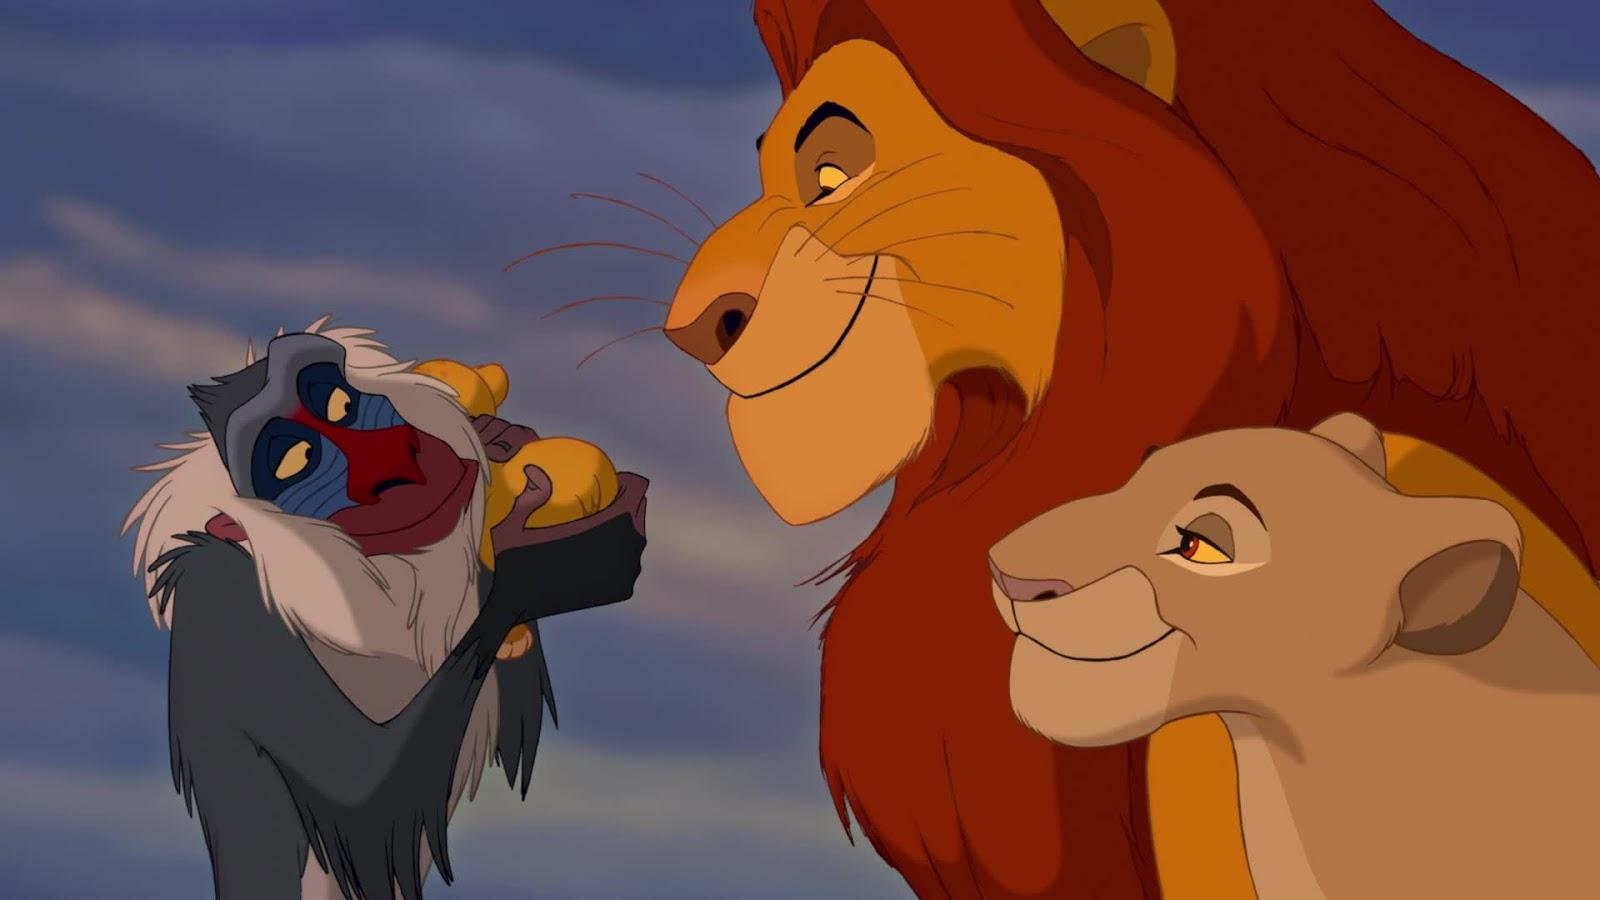 Immagini re leone walt disney